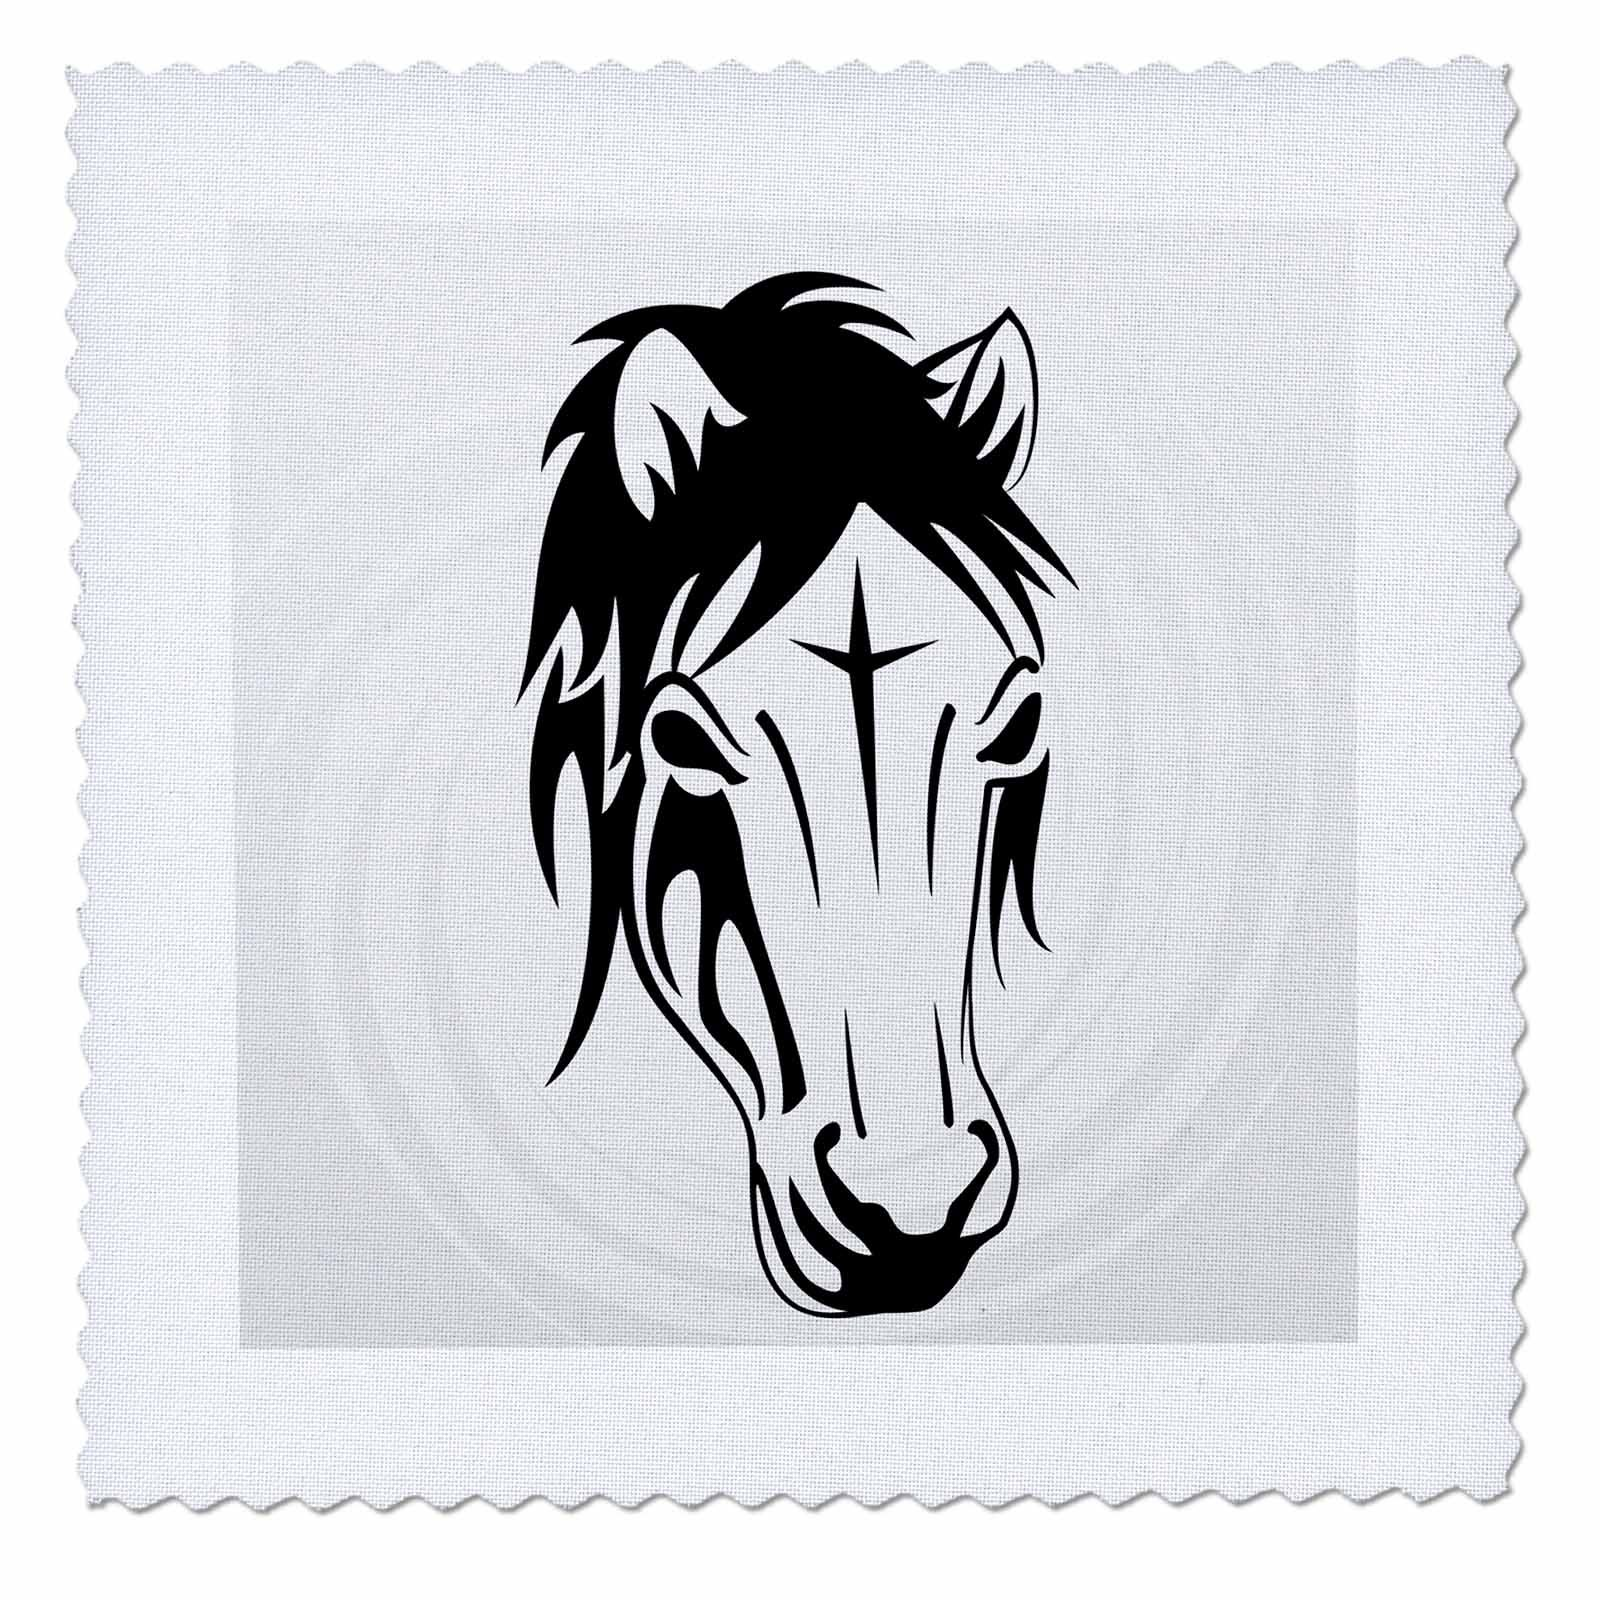 3dRose Sven Herkenrath Animal - Tribal Horse Horses Portrait Ride Riding Funny - 18x18 inch quilt square (qs_280313_7)